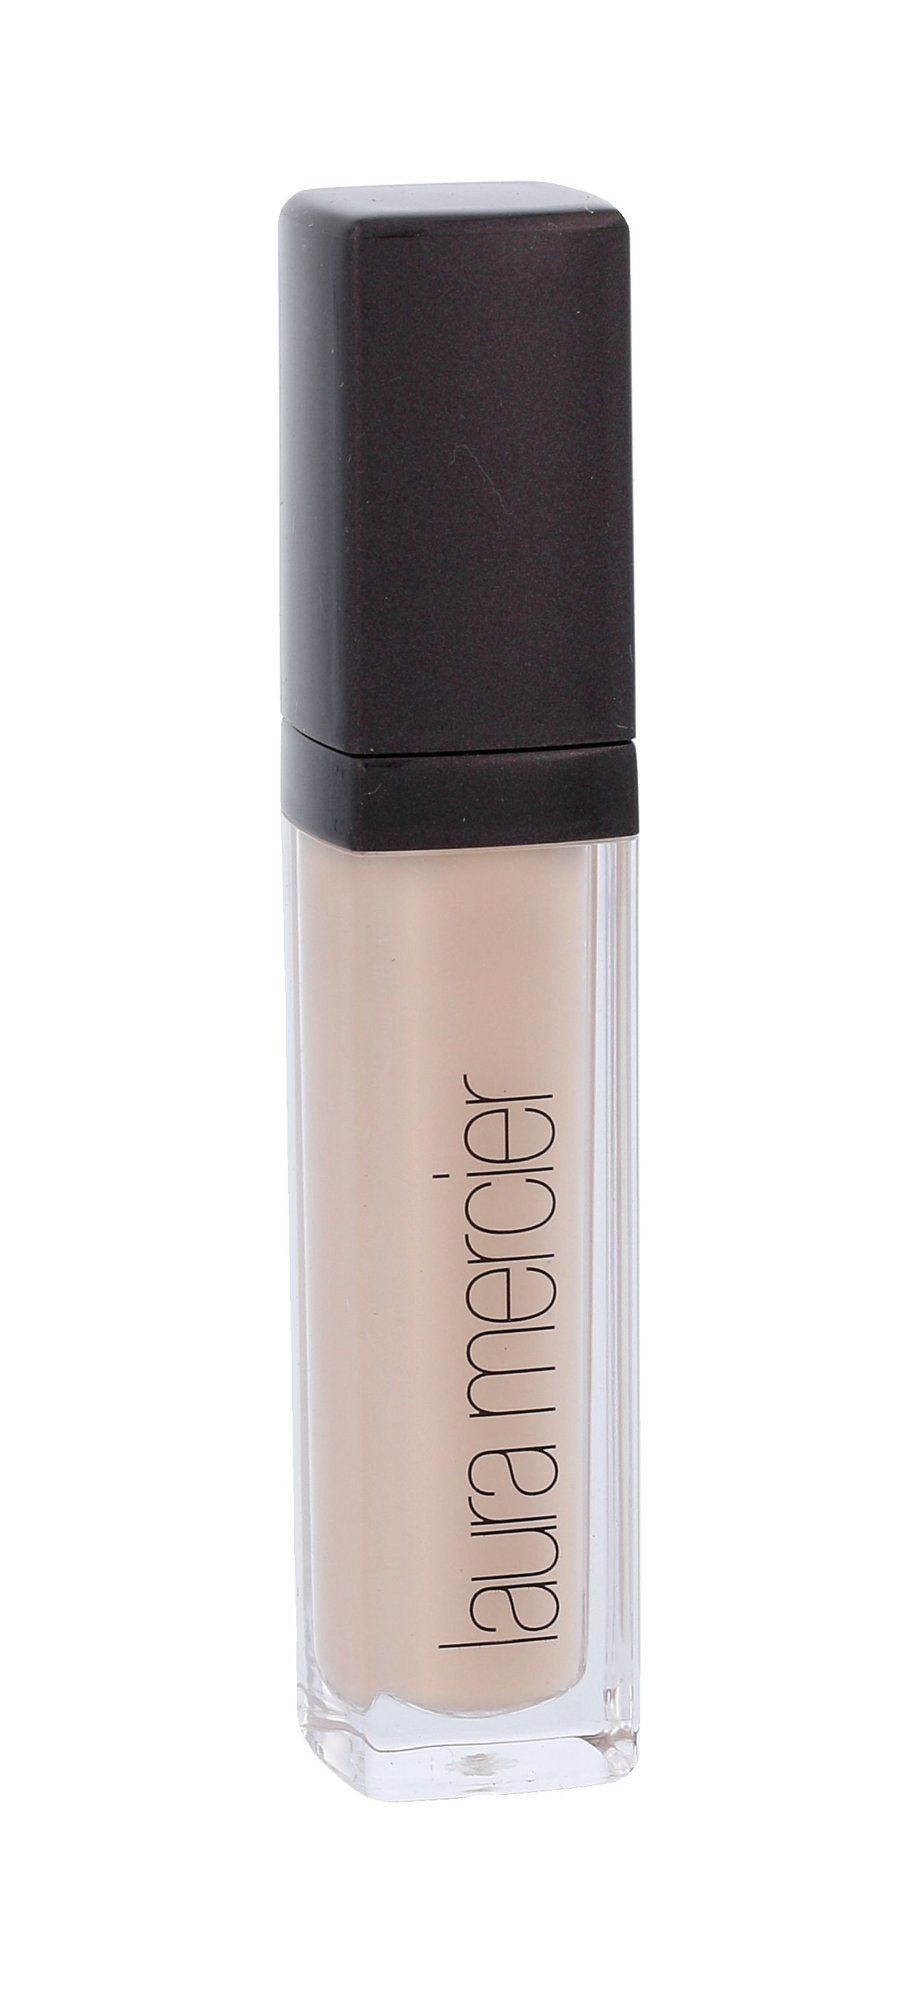 Laura Mercier Eye Basics Cosmetic 5,1ml Cotton